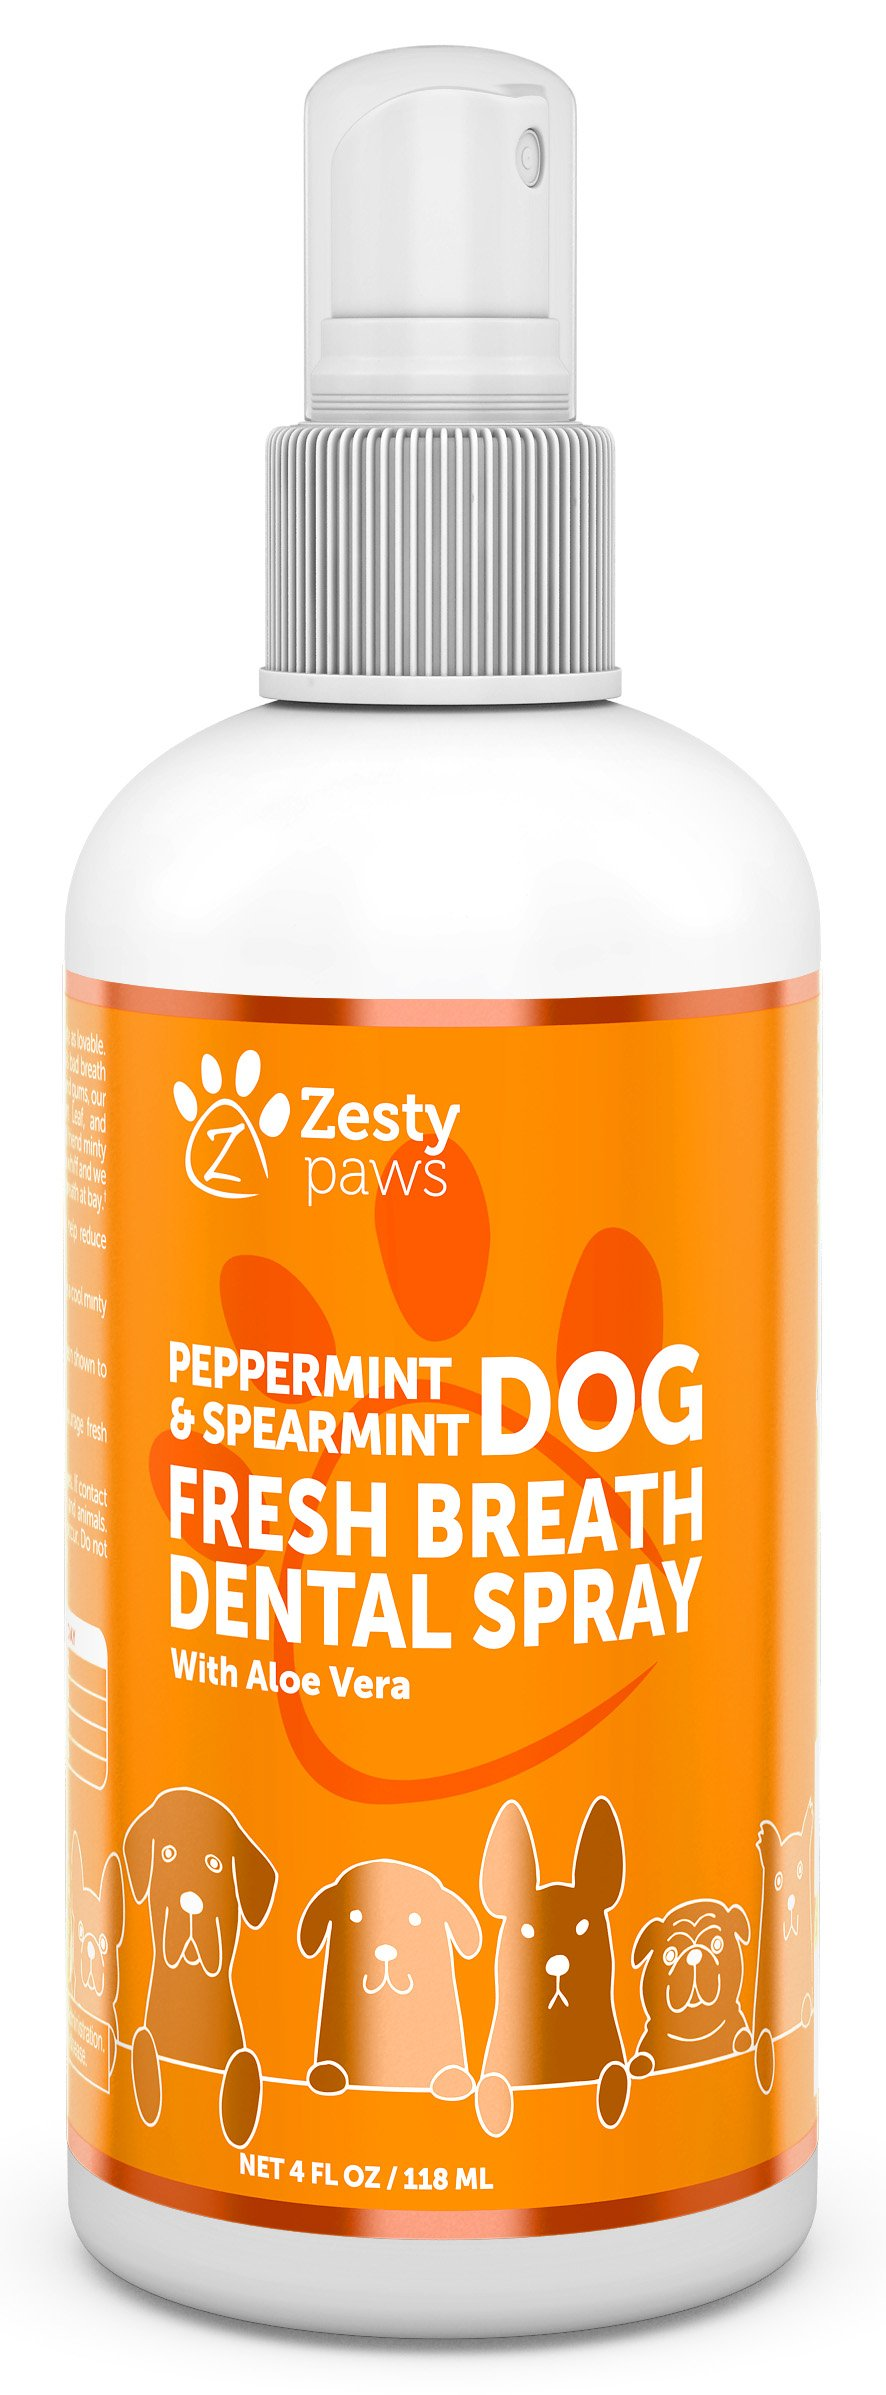 Fresh Breath Dental Spray for Dogs - Advanced Oral Hygiene Freshener with Peppermint Oil & Spearmint Leaf - Aloe Vera & Rosemary Oil to Support Teeth, Gum & Digestive Health + Remove Plaque, 4 FL OZ